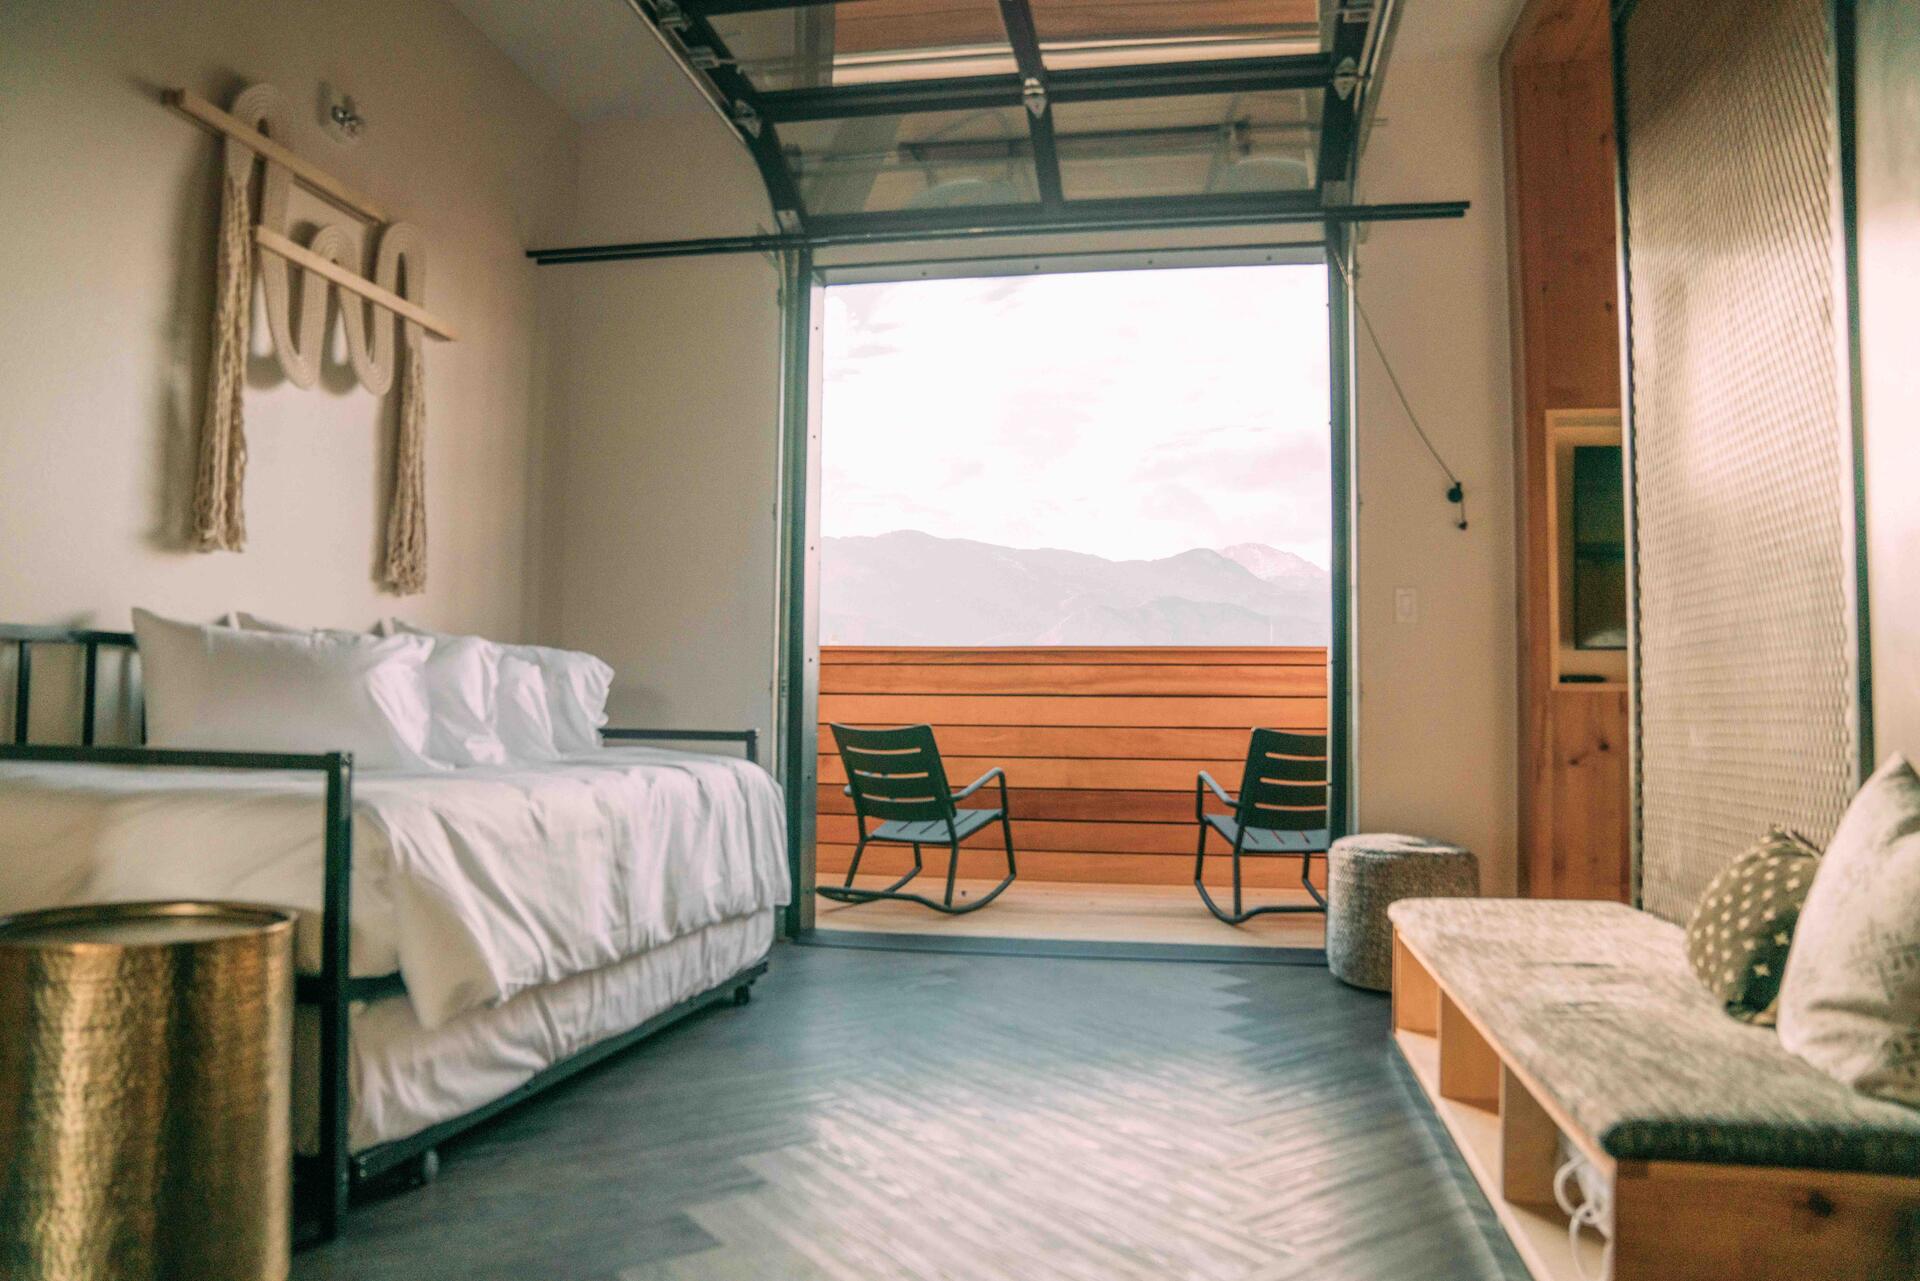 Jr. Queen Suite room at Kinship Landing in Colorado Springs